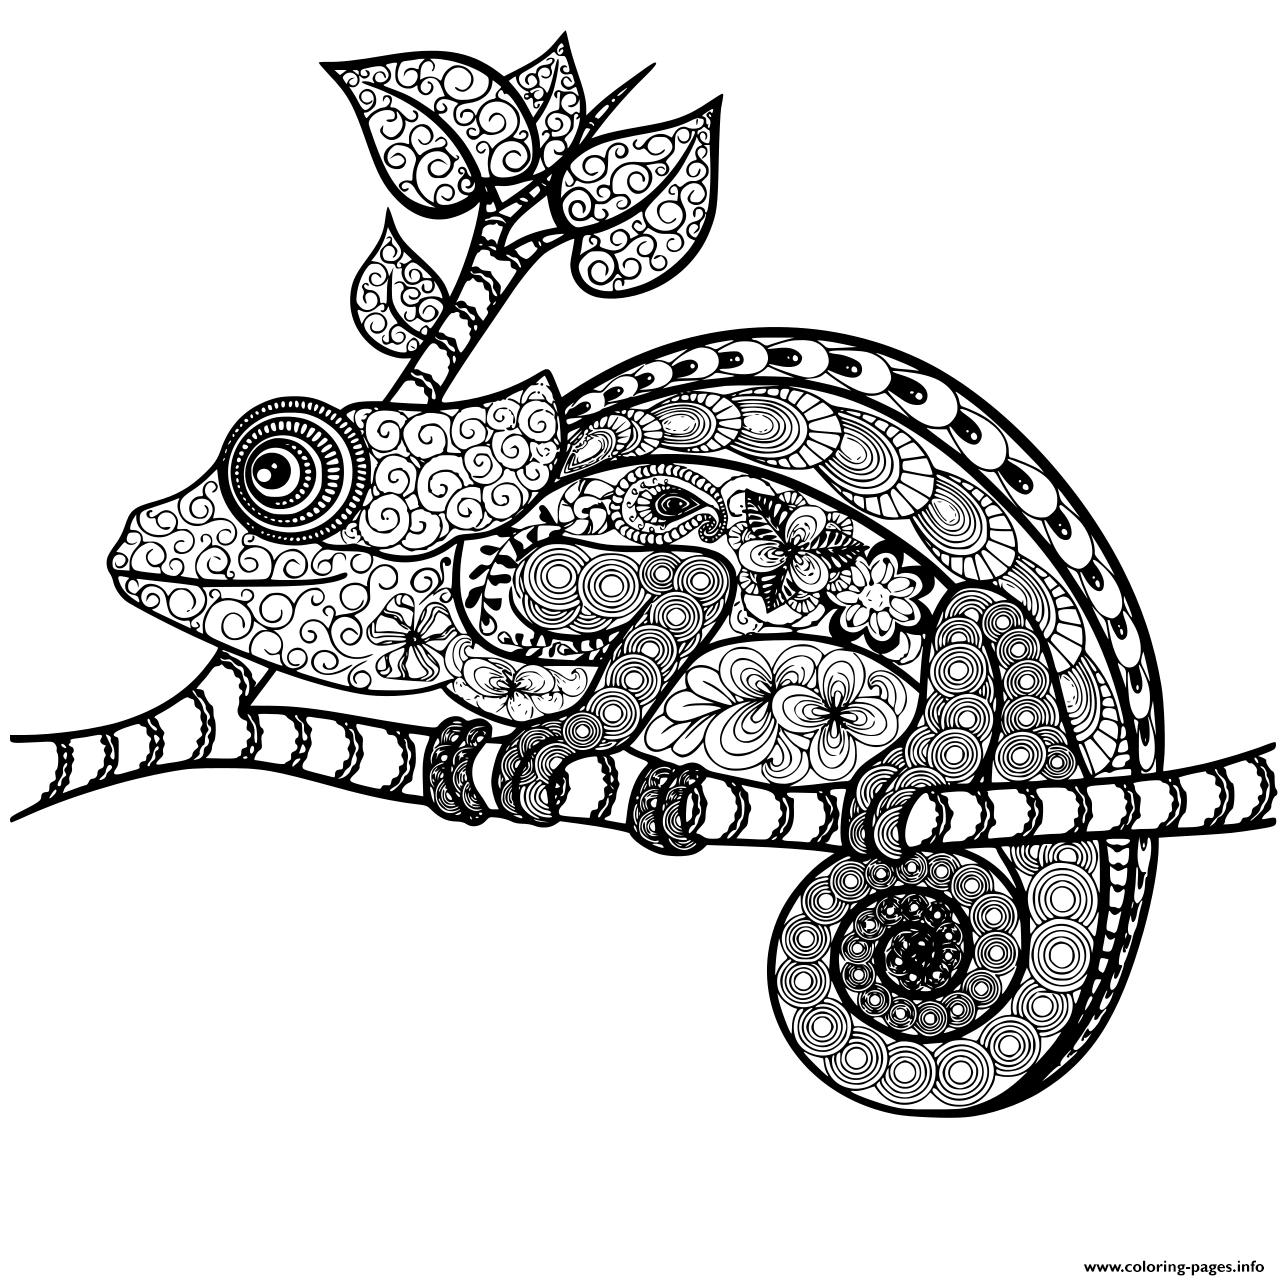 Chameleon Mandala Adult Zentangle Coloring Pages Printable